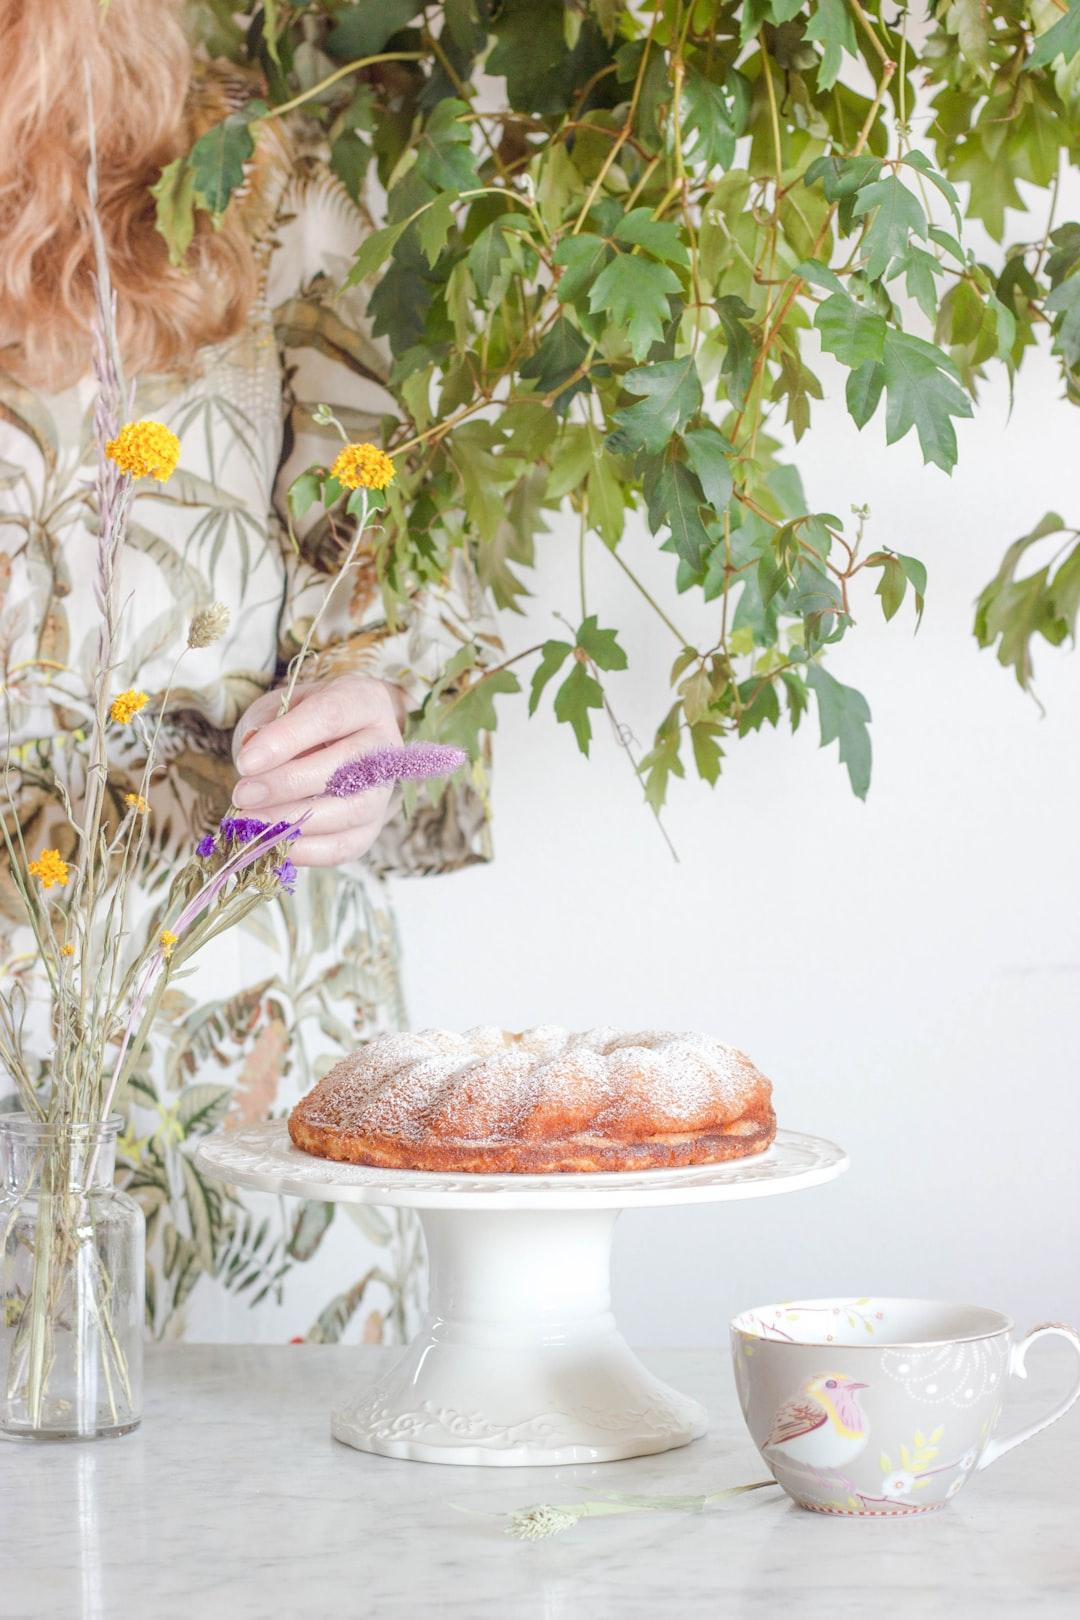 Spring Lemon Cake